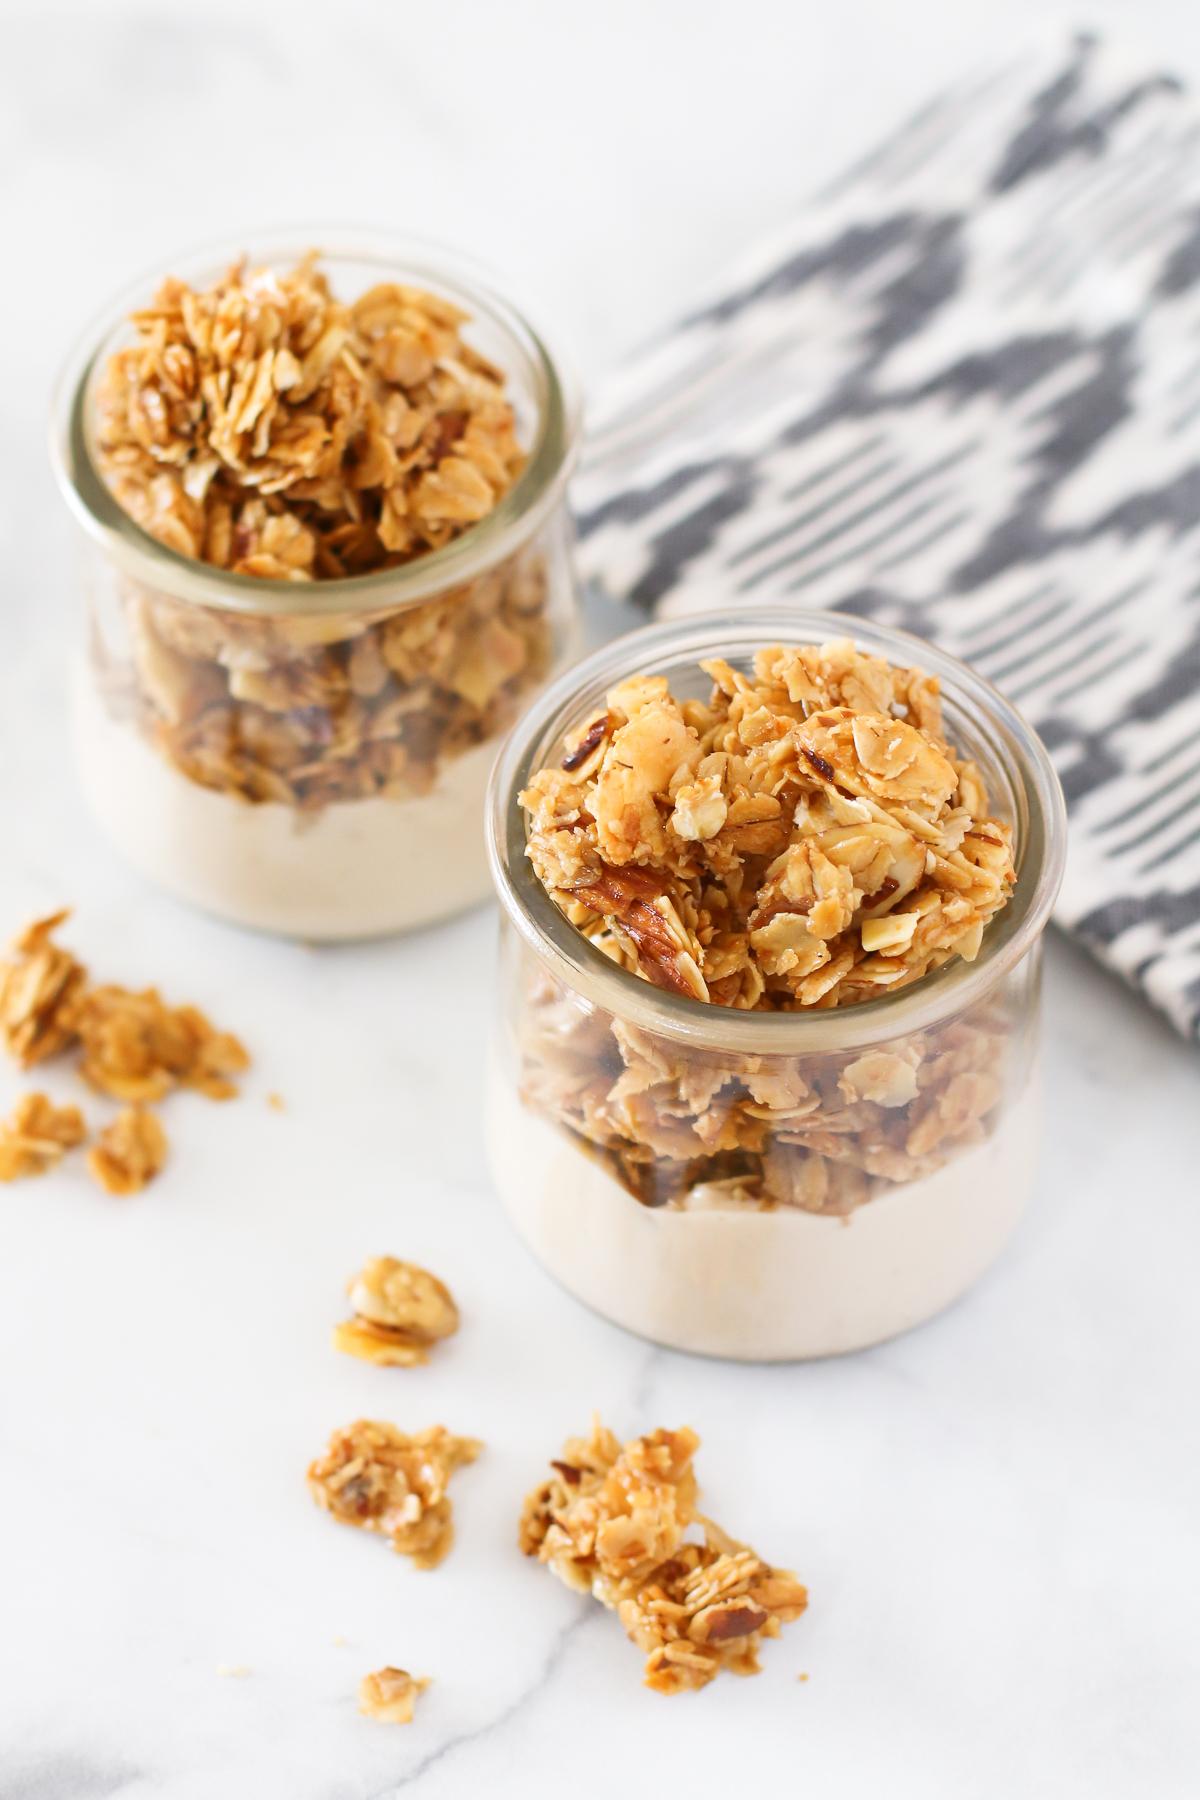 Gluten Free Honey Almond Granola. Crunchy, sweet and the perfect breakfast treat!